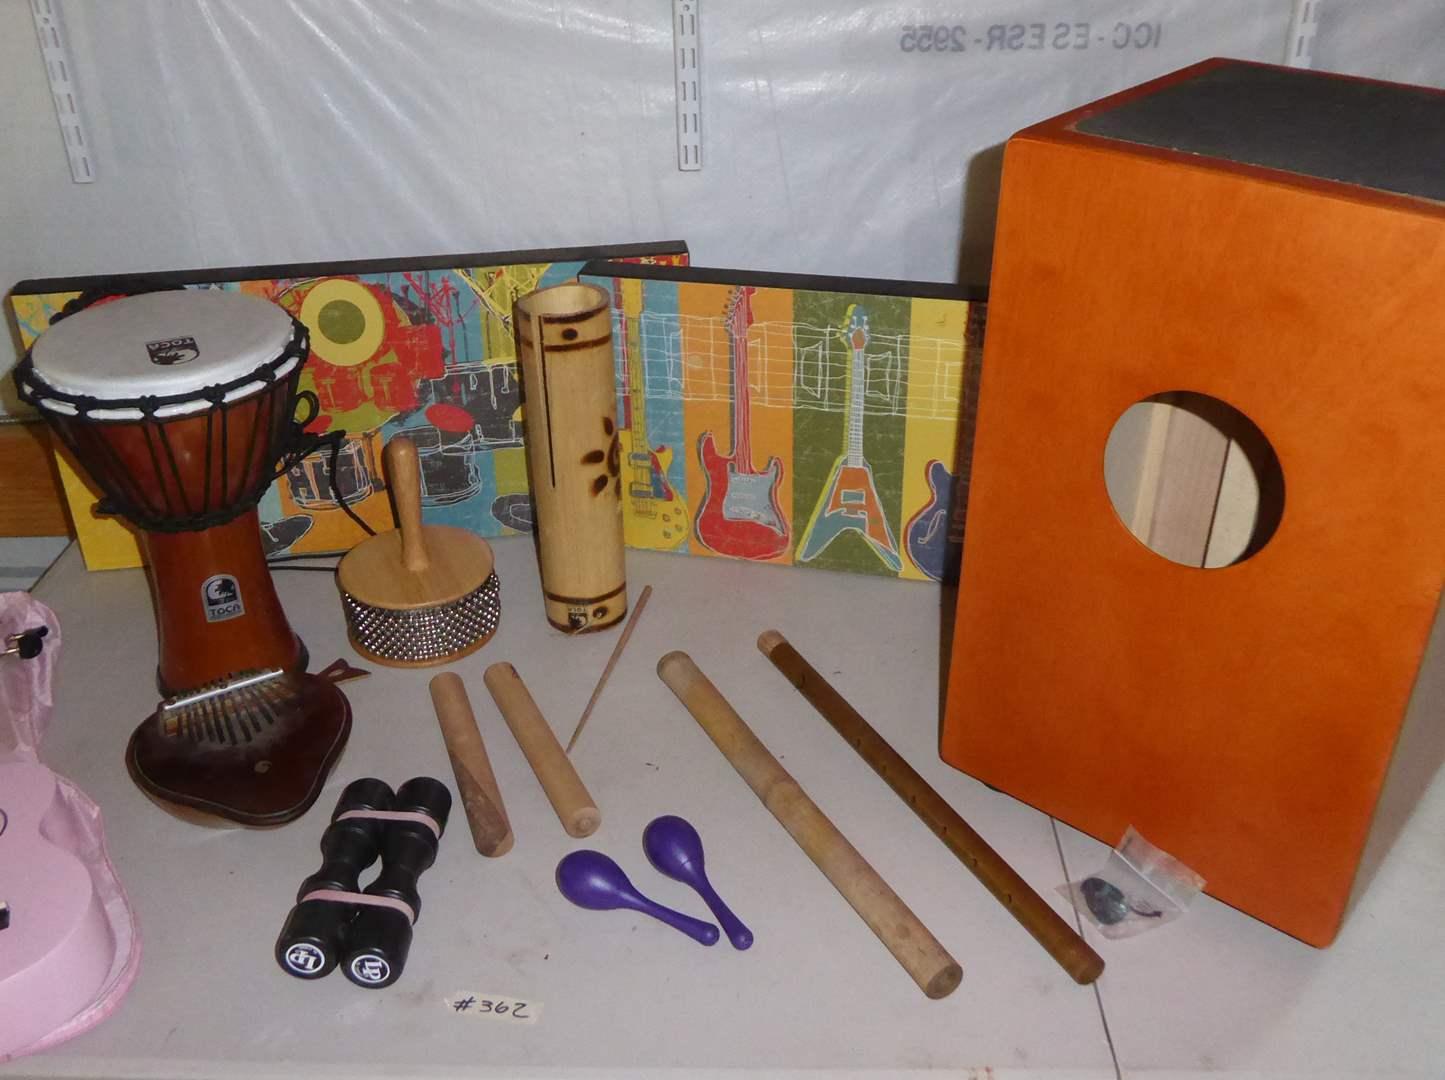 Lot # 362 - Meinl Cajon, Mahalo U30 PK Ukulele, Percussion Instruments & Flutes